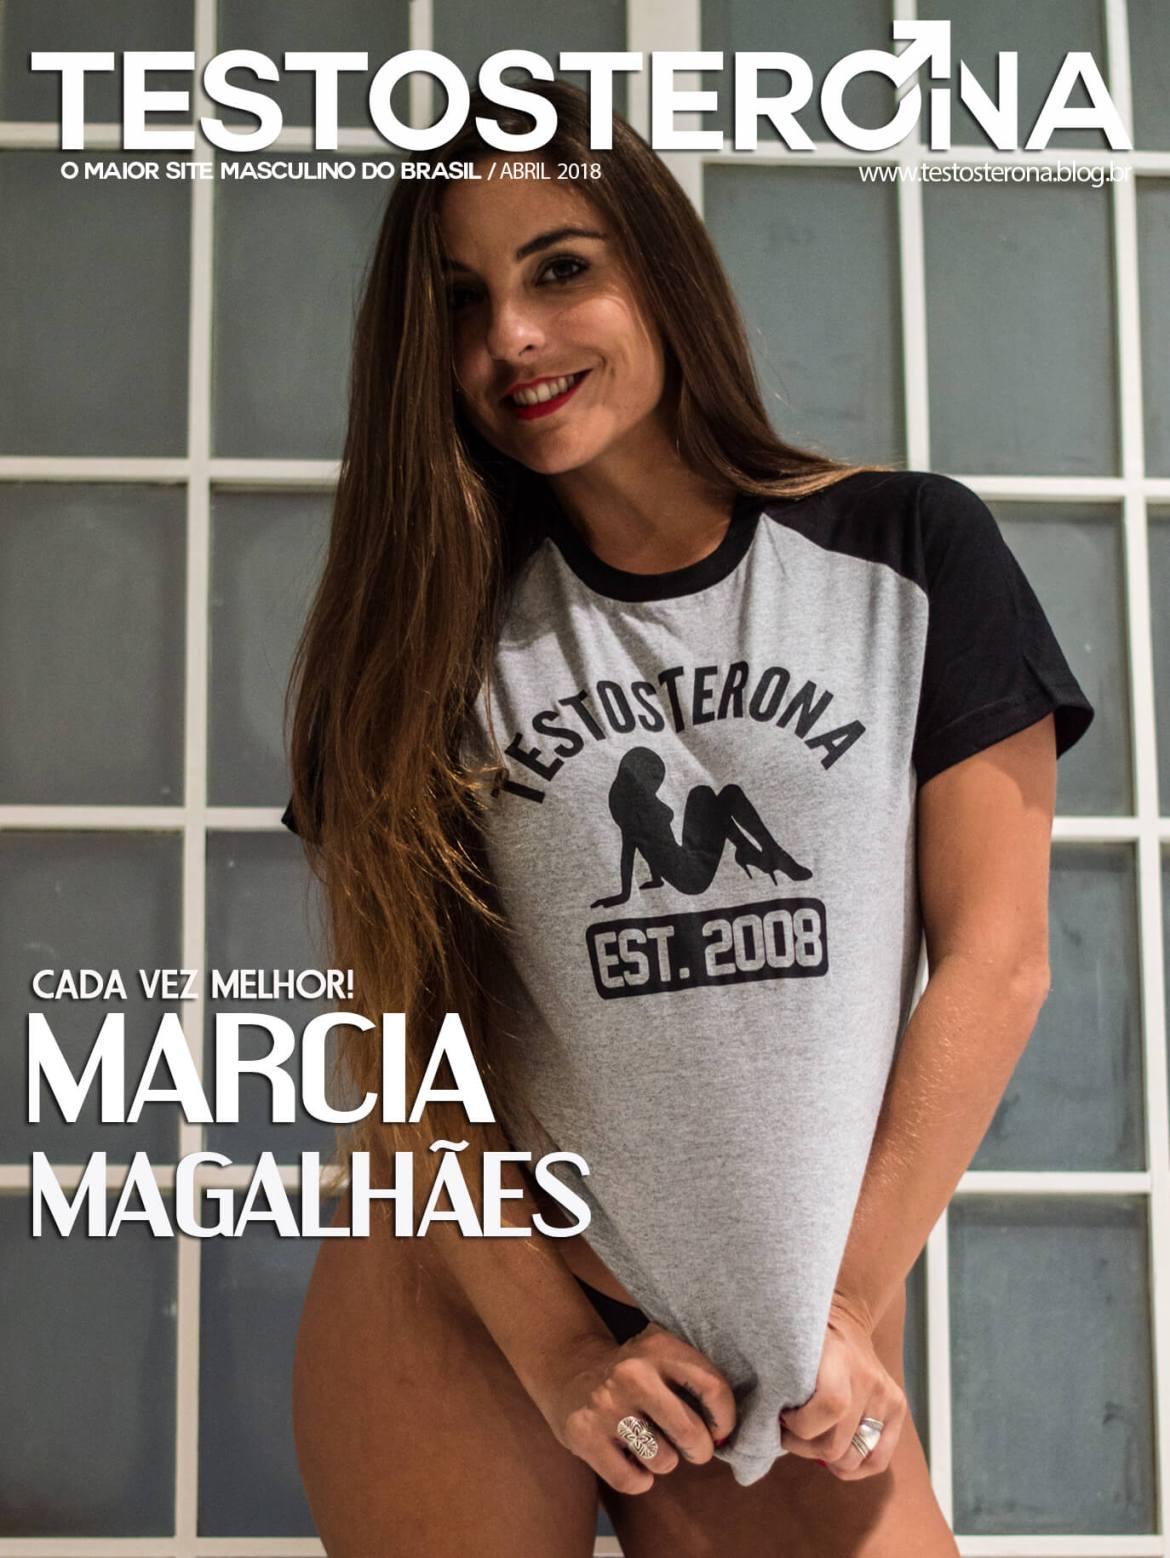 Márcia Magalhães Testosterona Girls